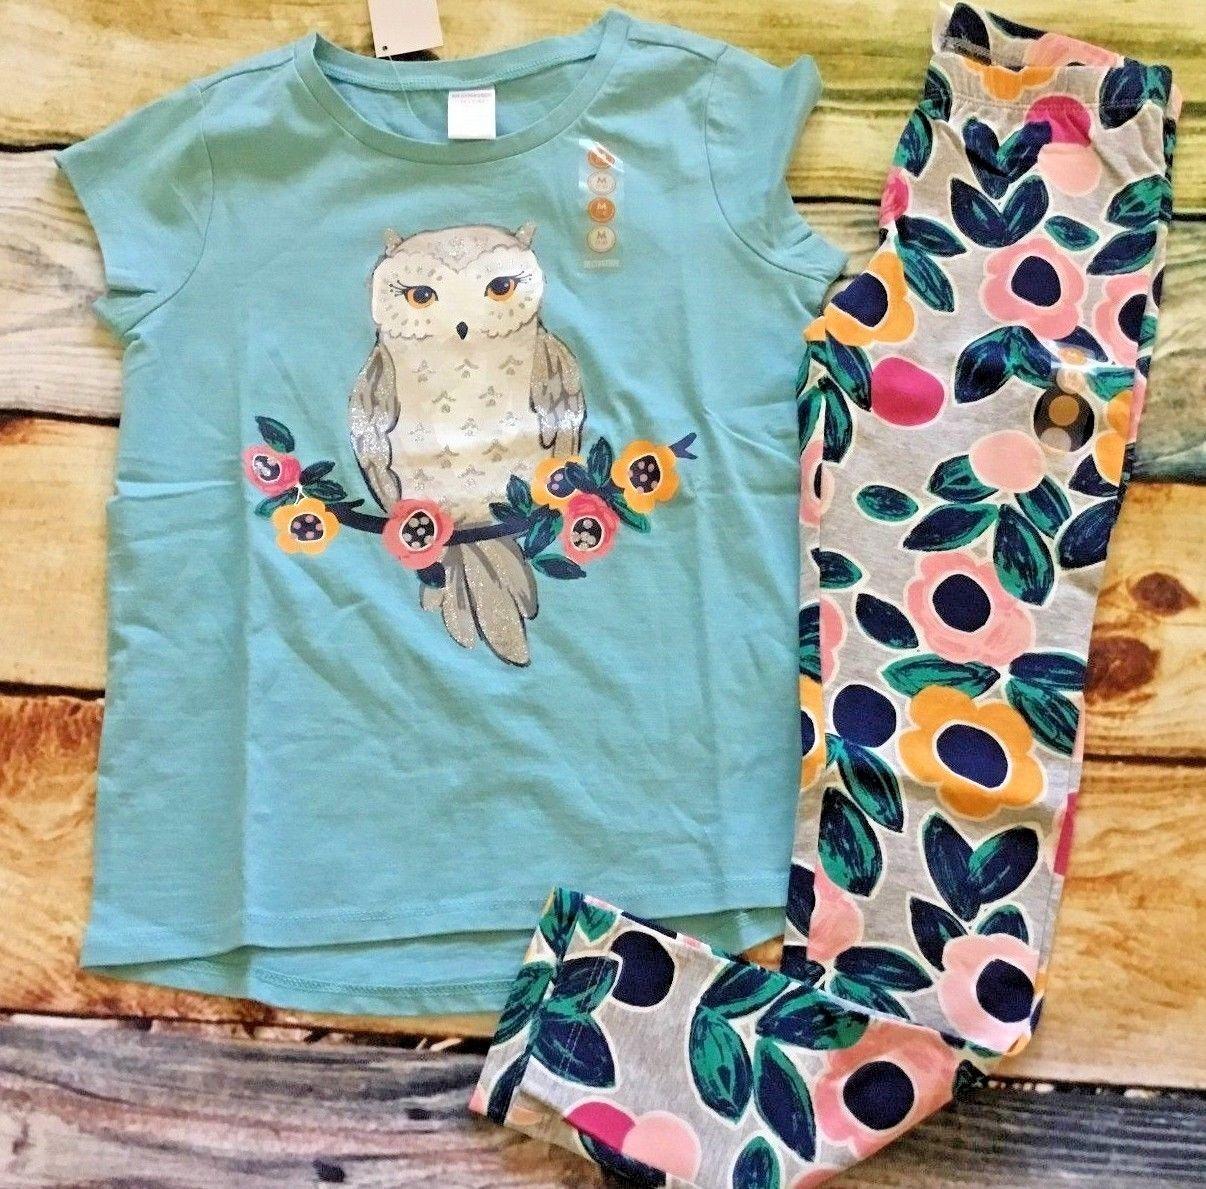 Gymboree Mix N Match 10 12 Owl Top Flower Floral Leggings NWT School Outlet